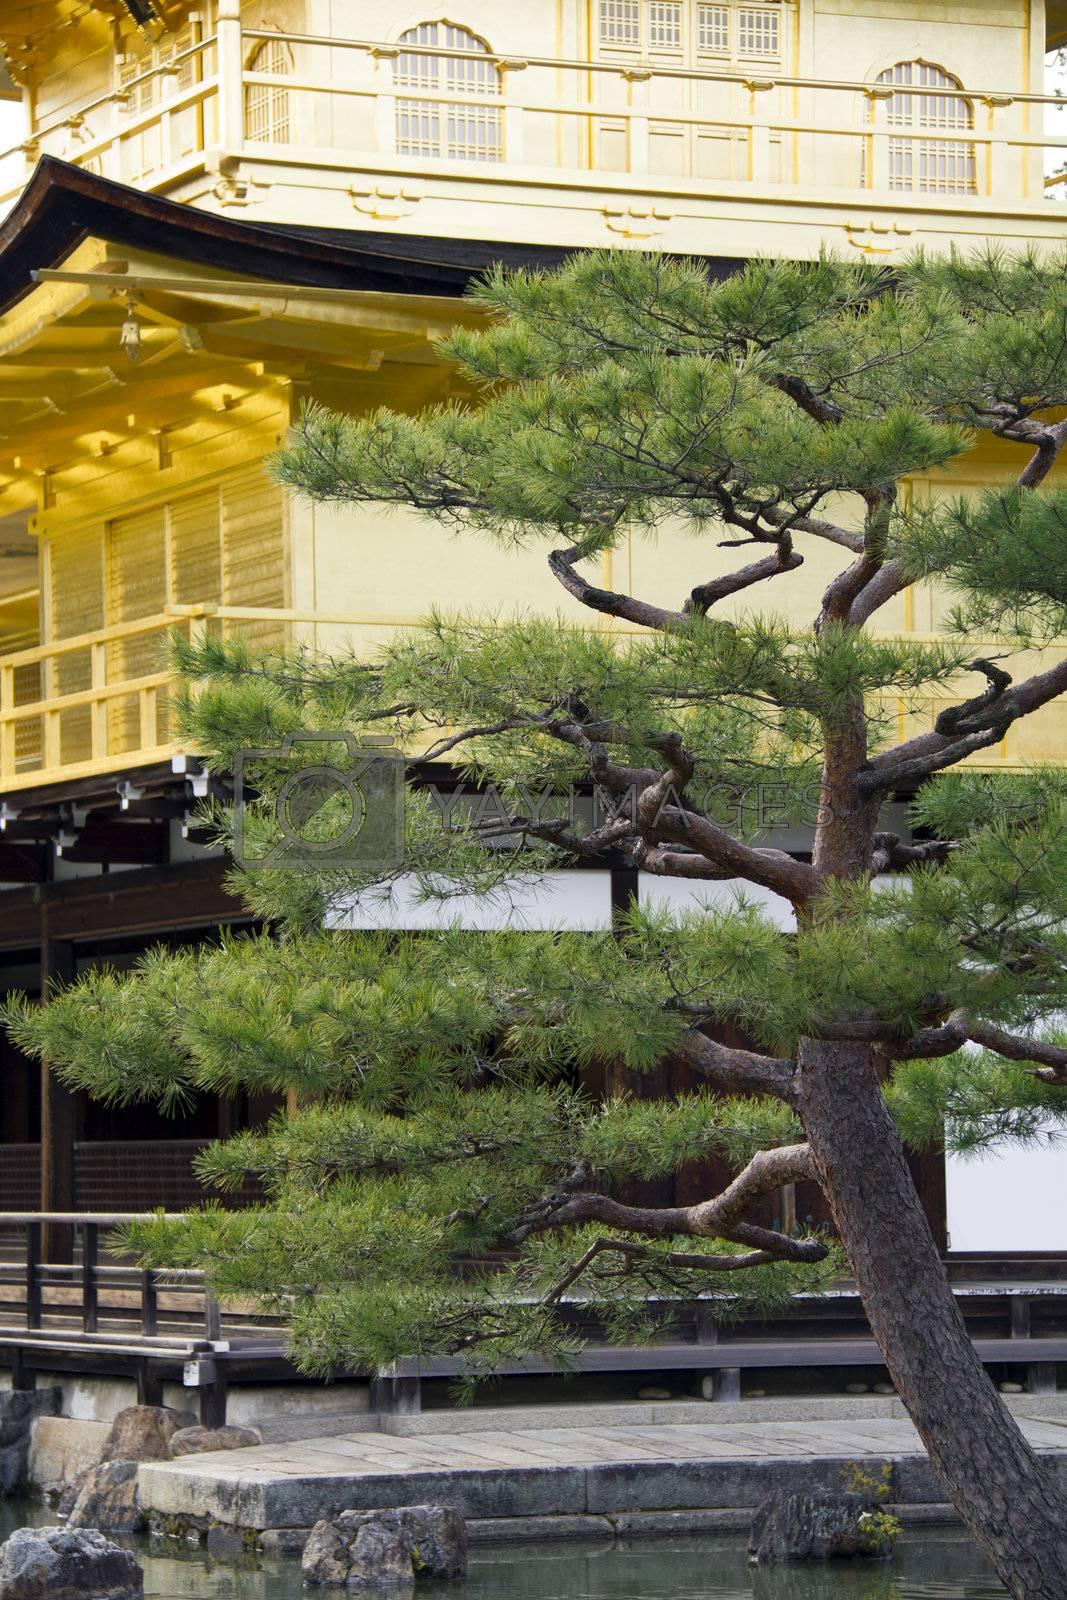 Detail of the peaceful Golden Pavilion or Kinkakuji temple garden in Kyoto, Japan